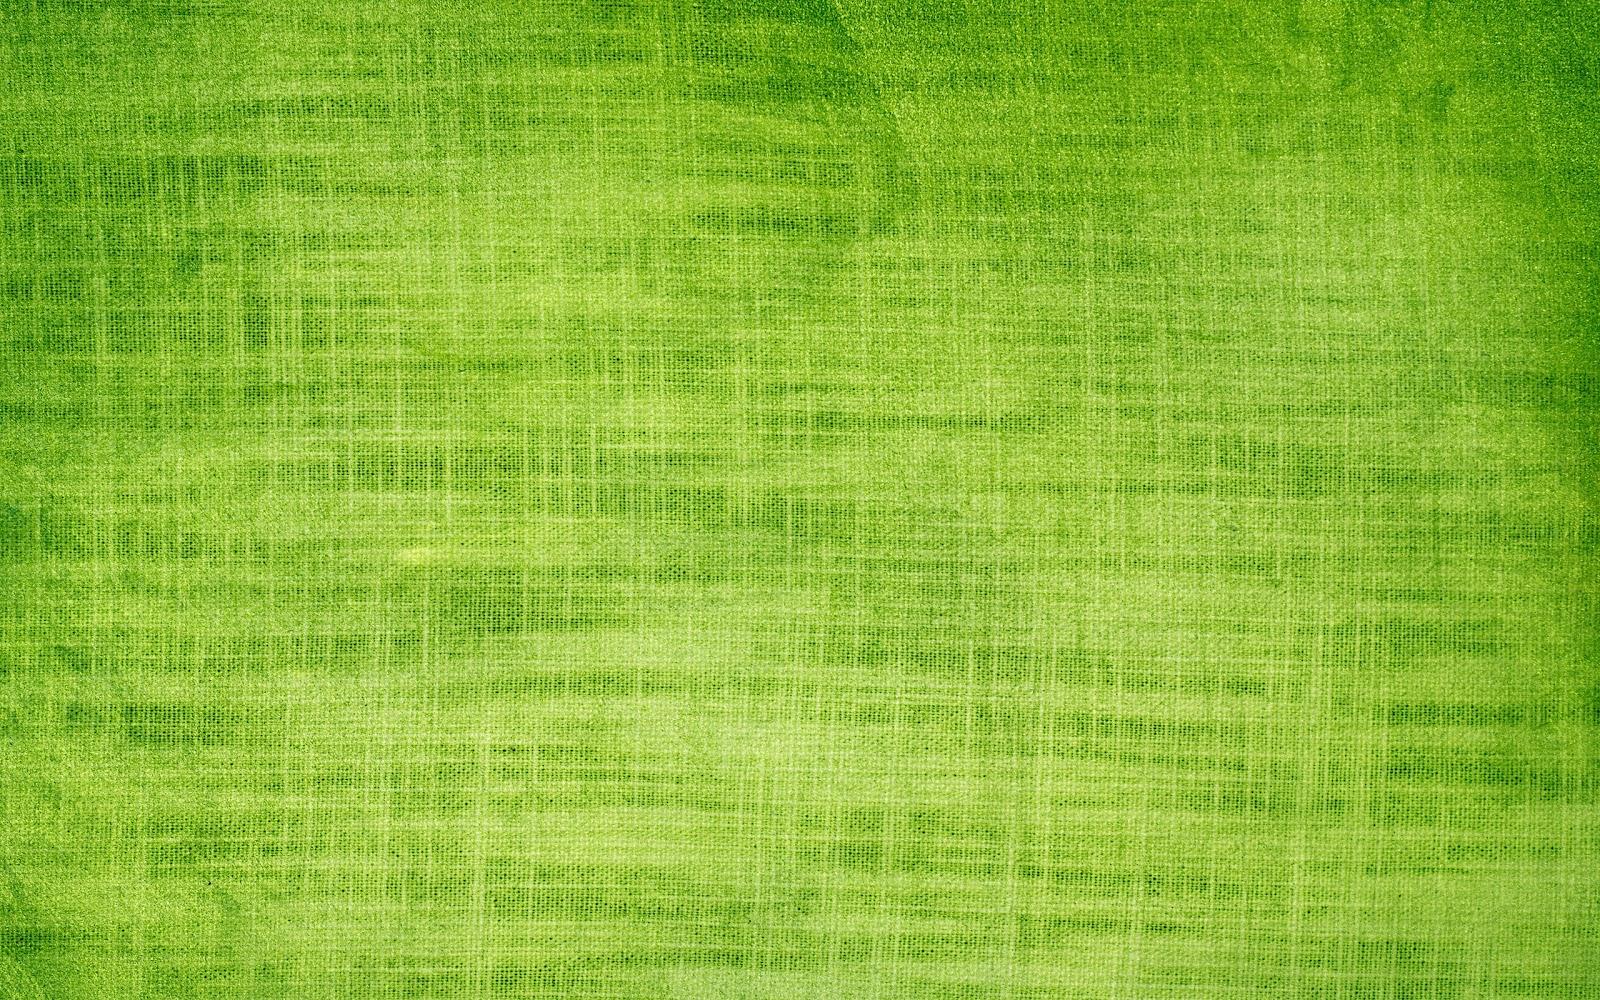 Groene abstracte hd achtergrond bureaublad achtergronden - Wallpaper amandelgroene ...